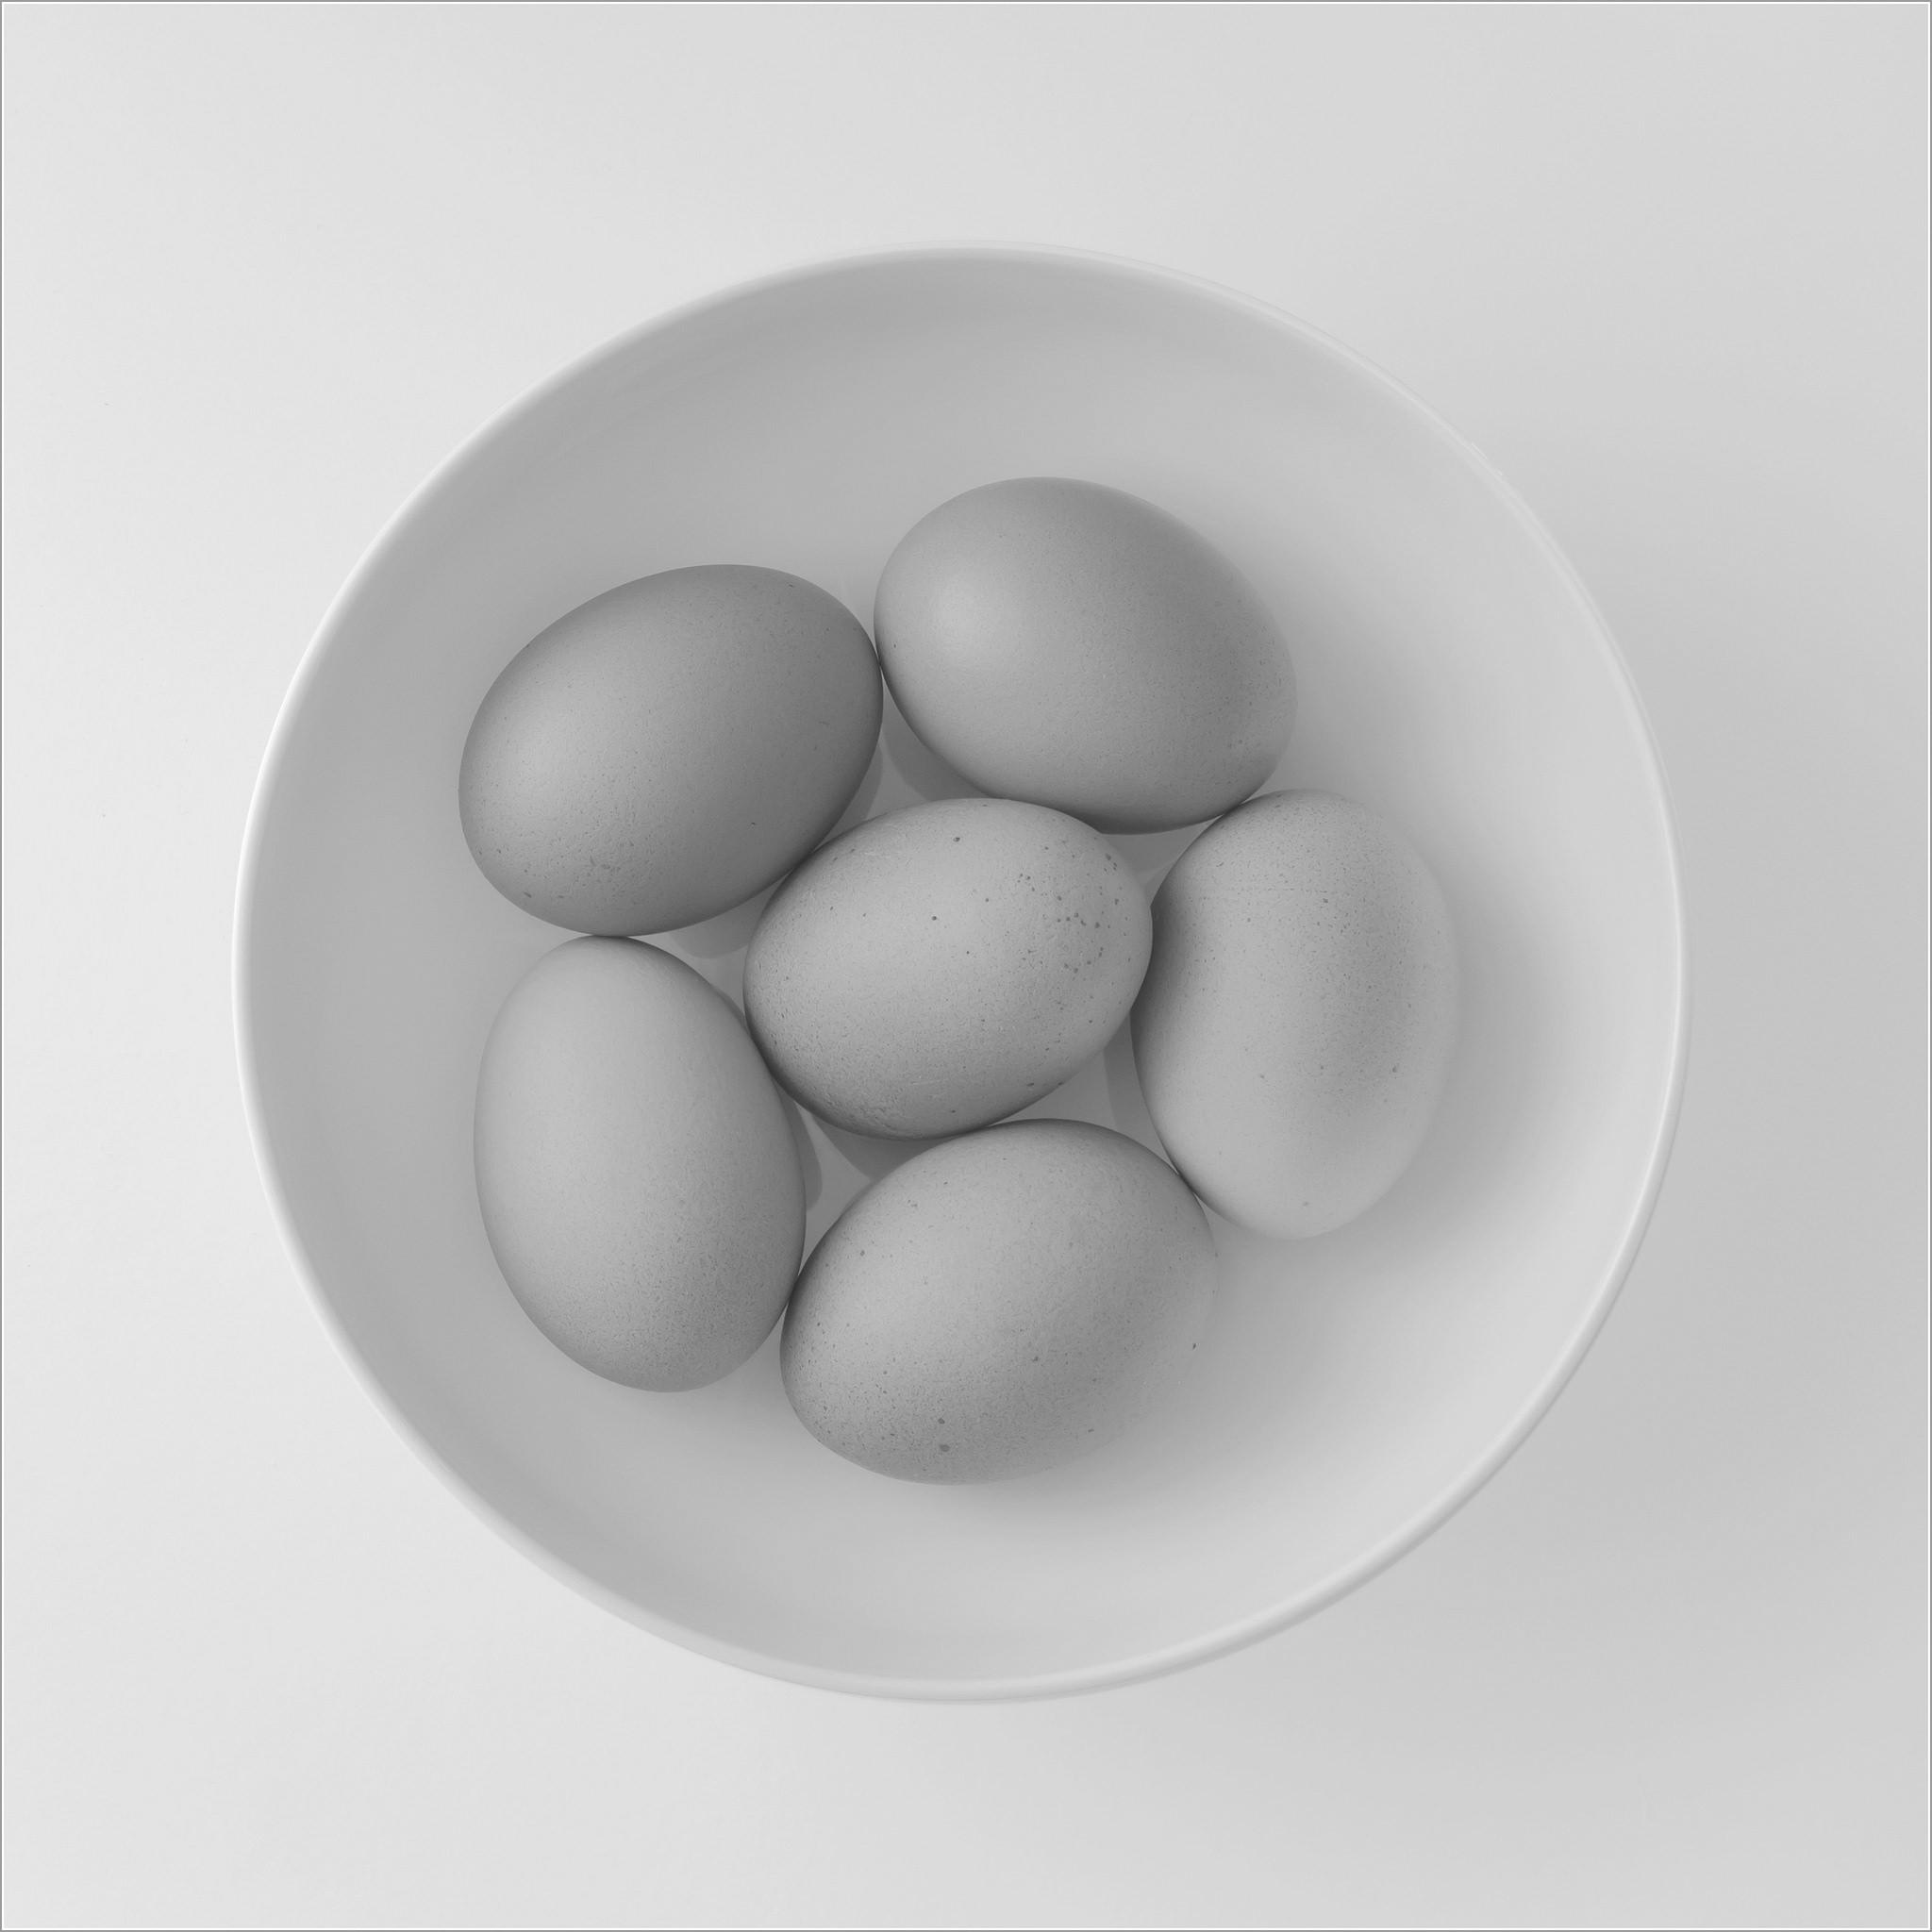 Eggs is Eggs